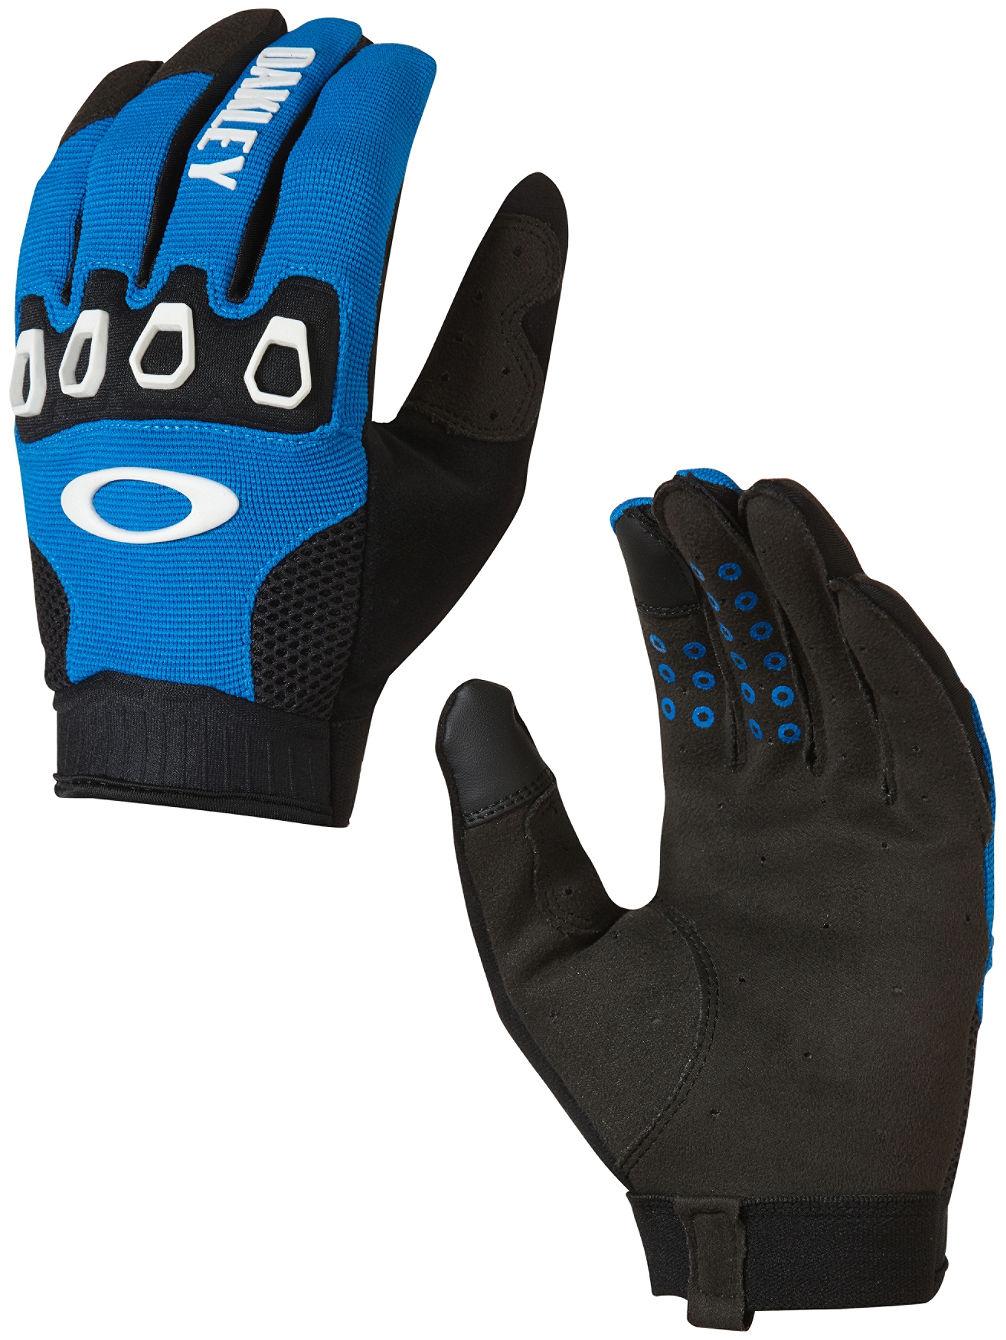 Oakley Automatic 2.0 Gloves - oakley - blue-tomato.com